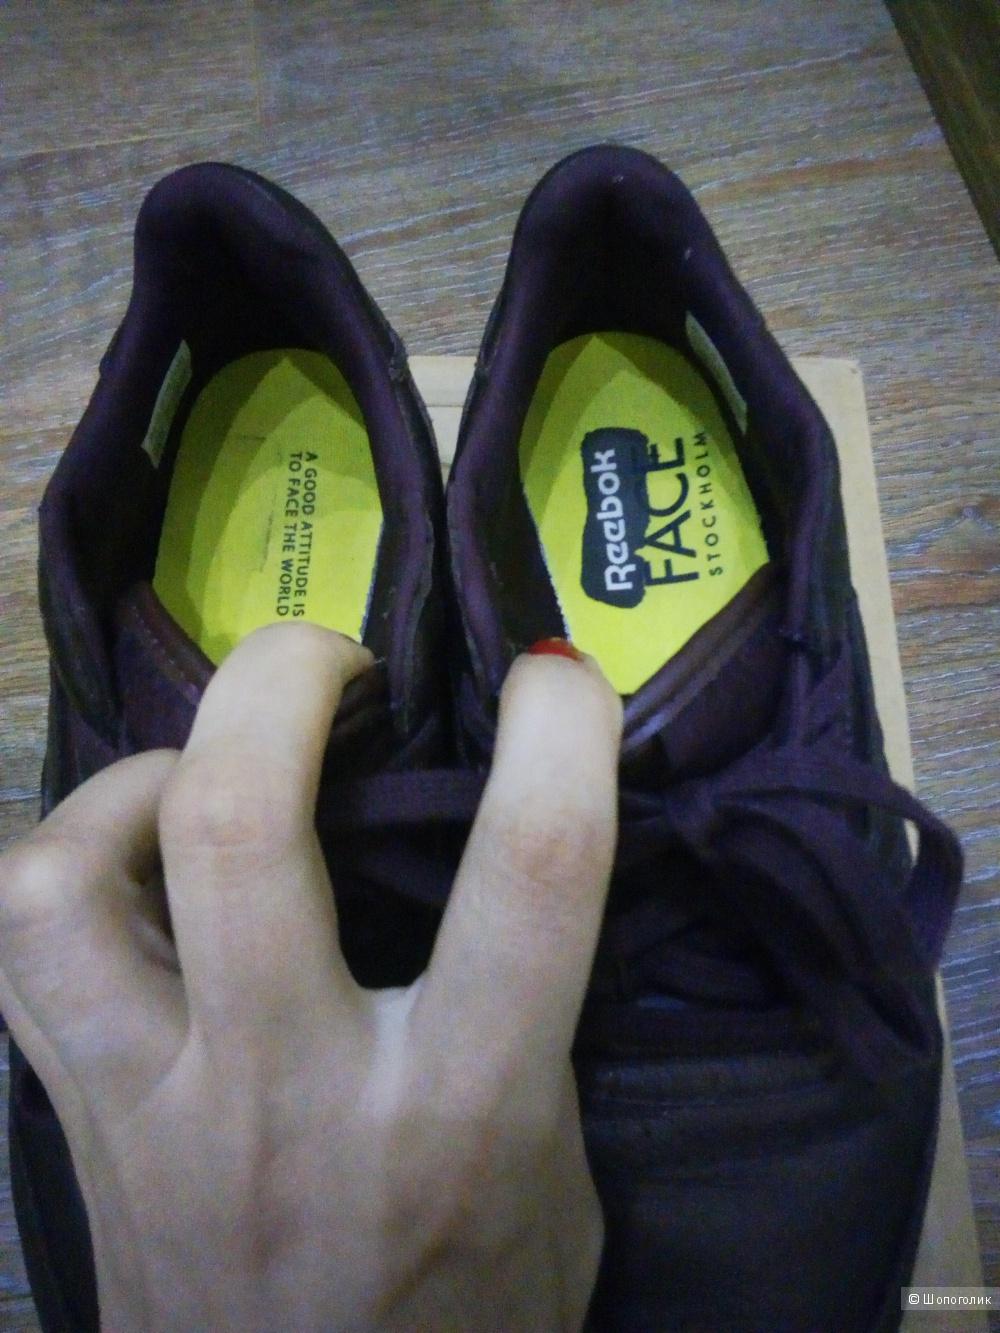 Кроссовки Reebok размер 7.5 USA